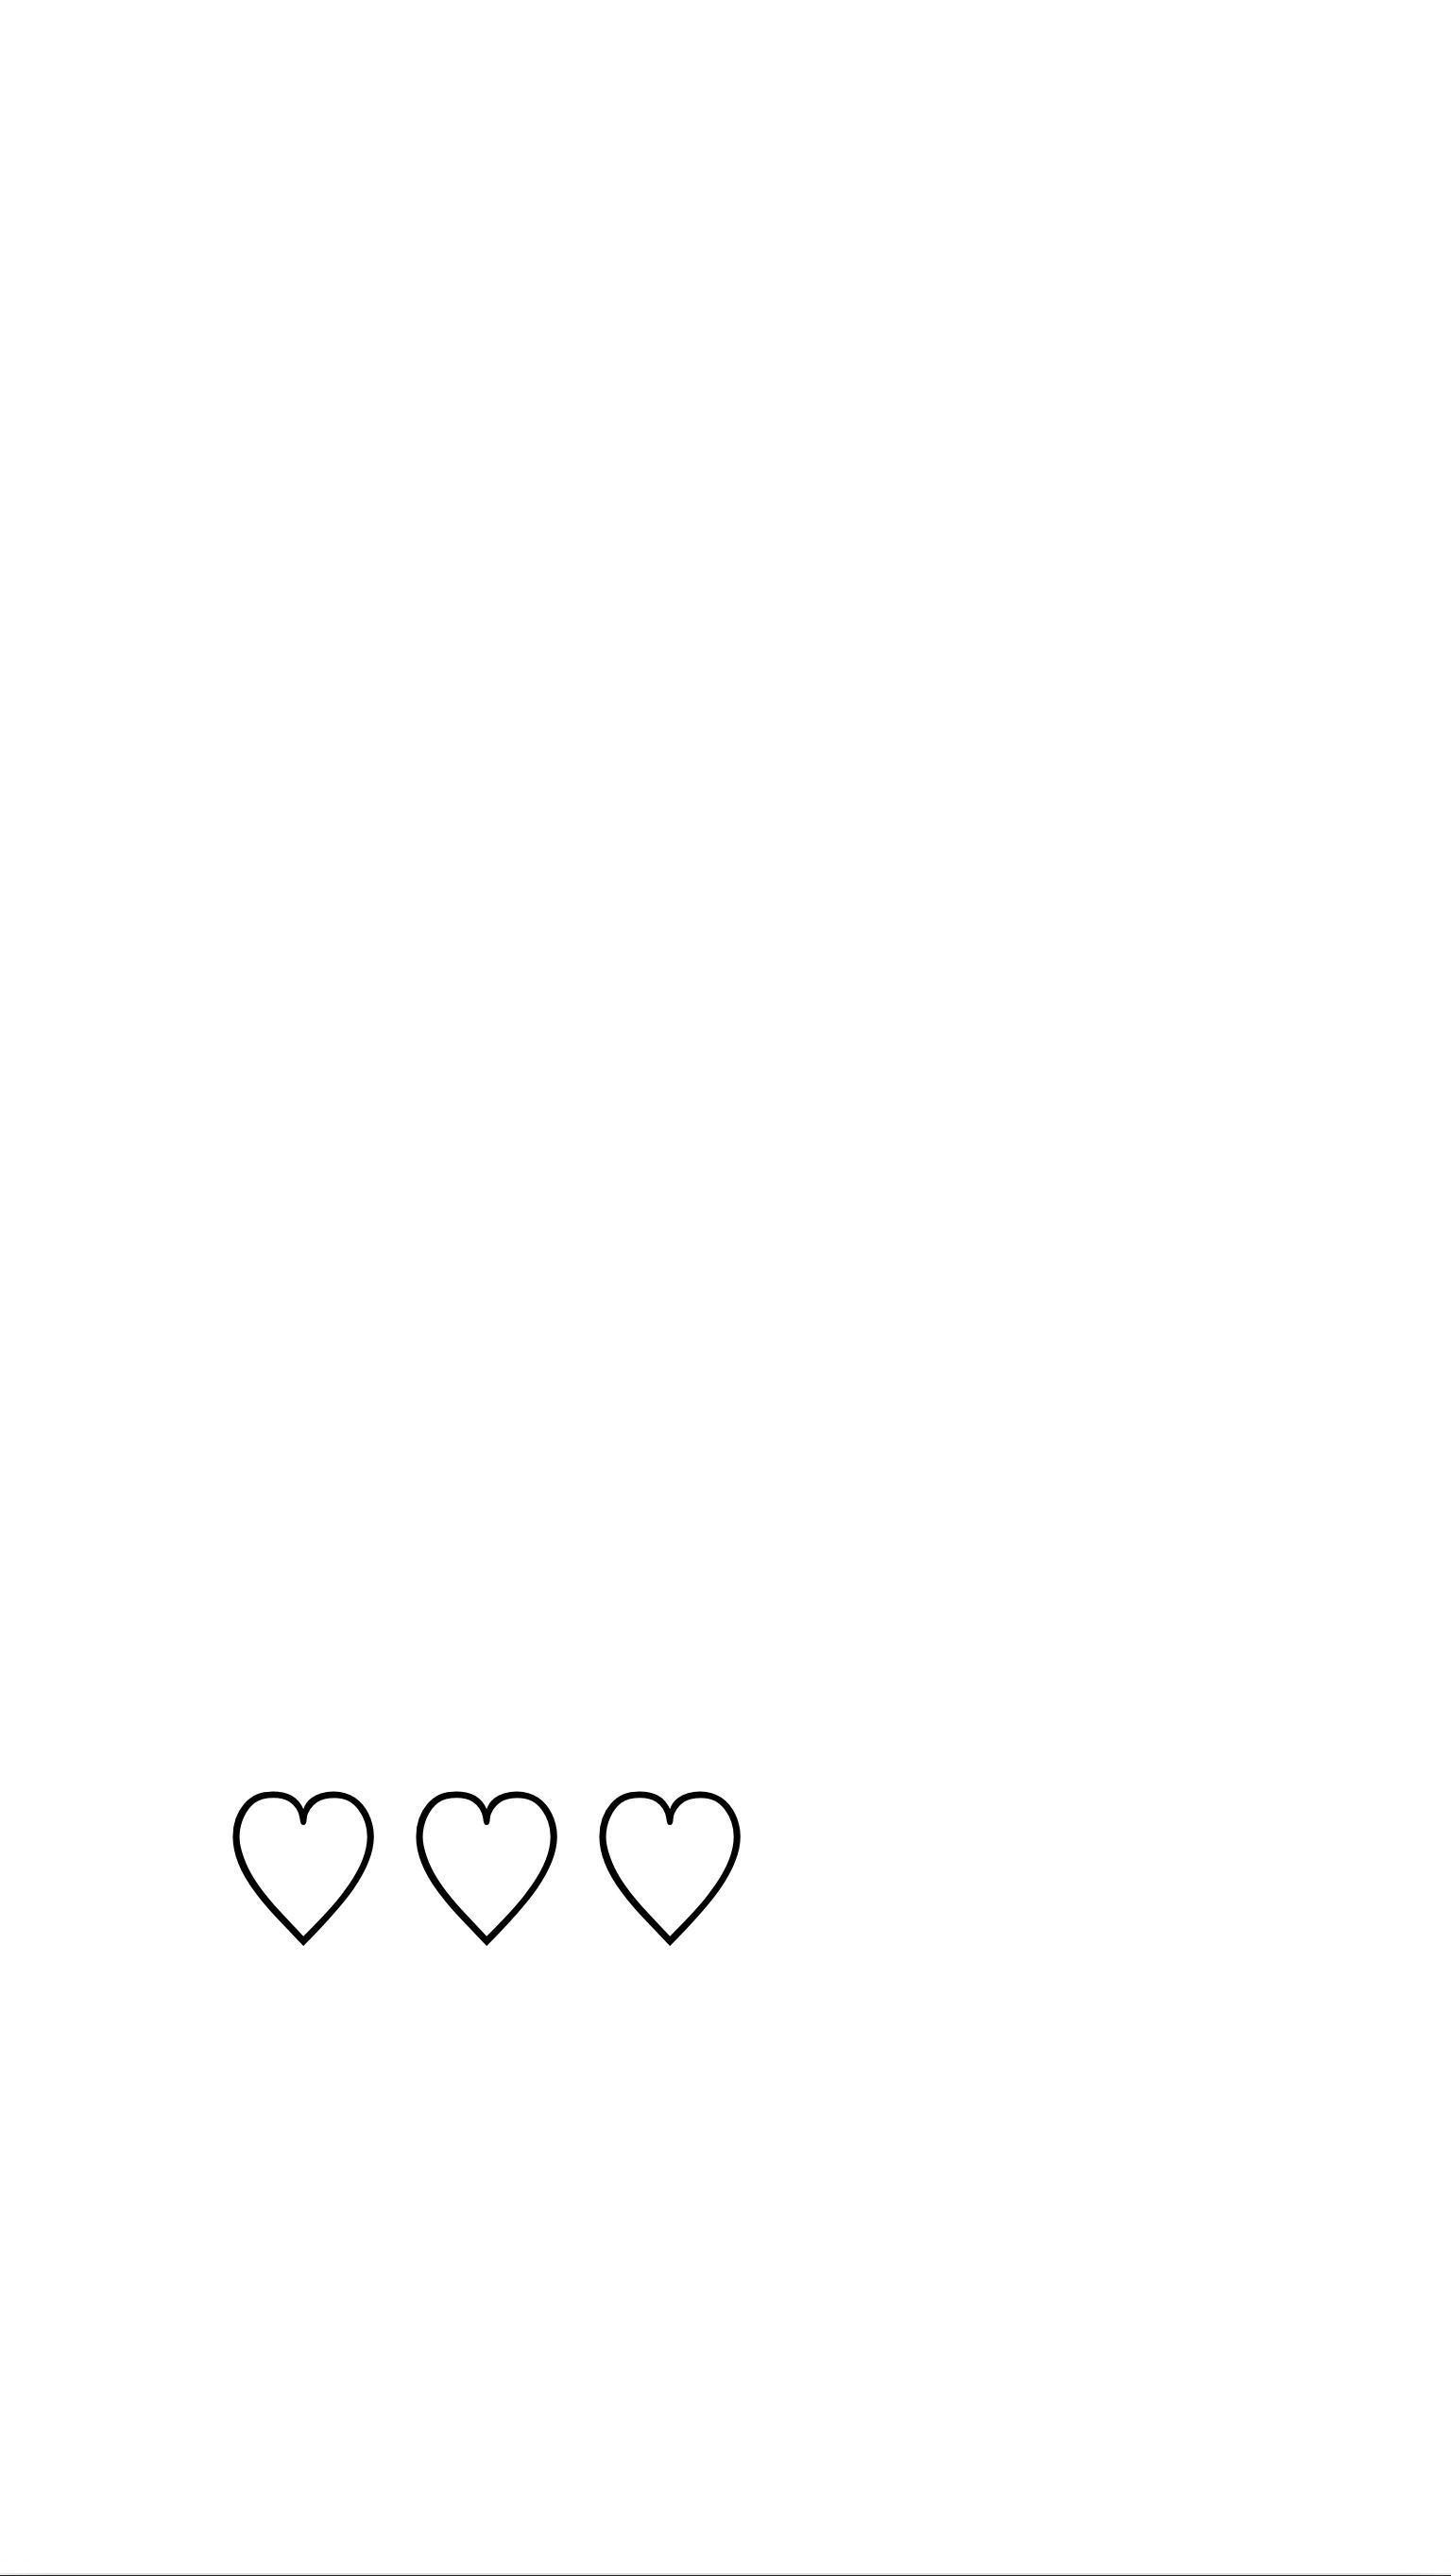 three hearts - Wallect